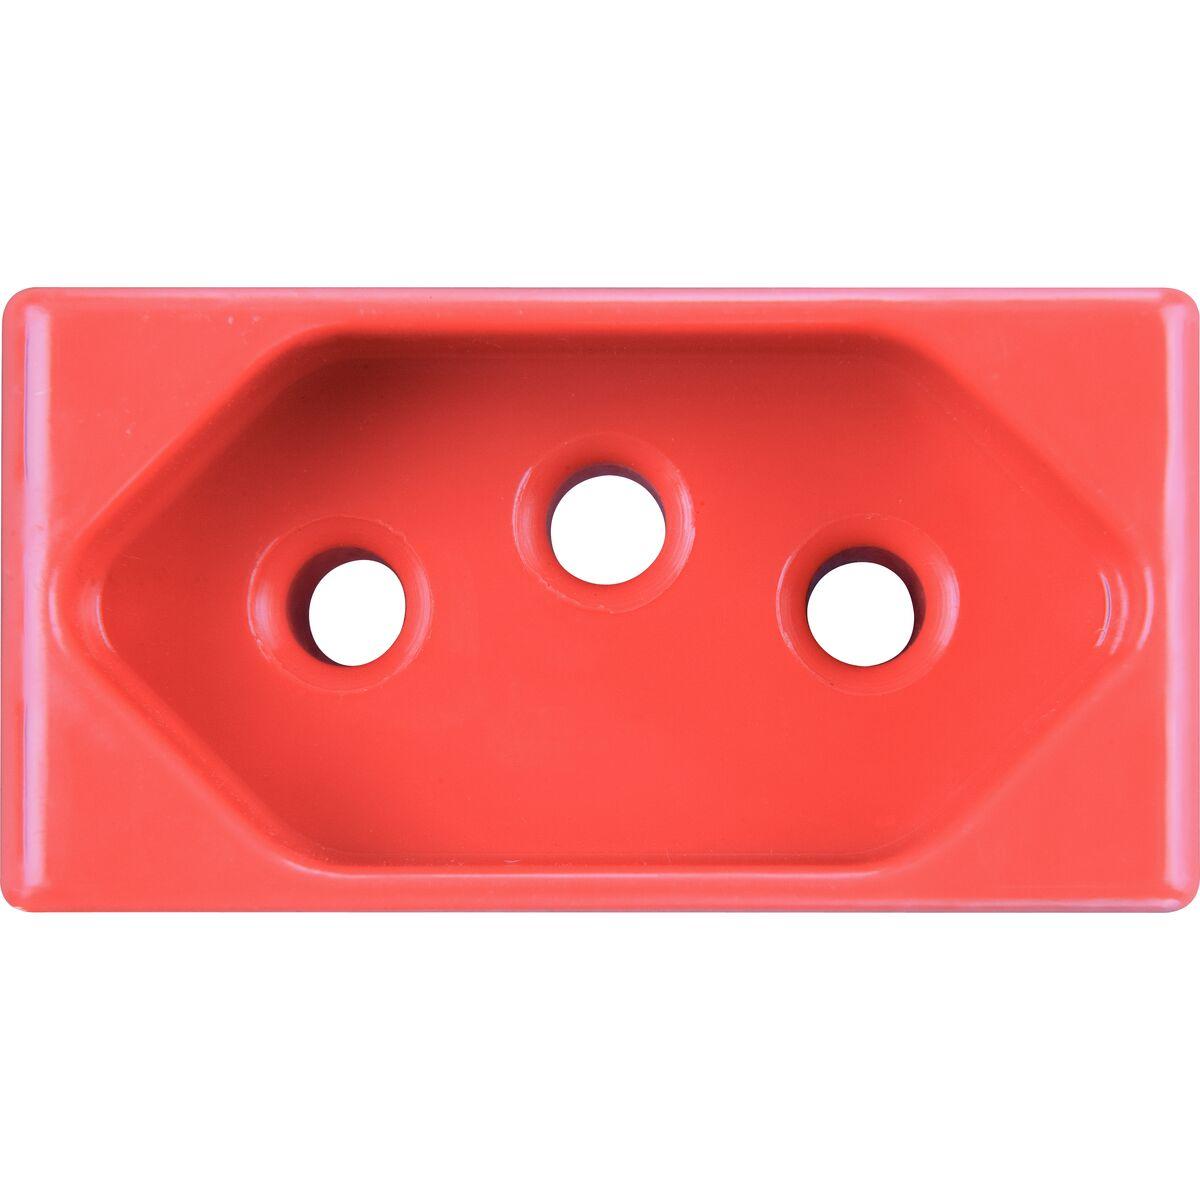 Modulo Tomada 20a Vermelha Liz/Lux 2